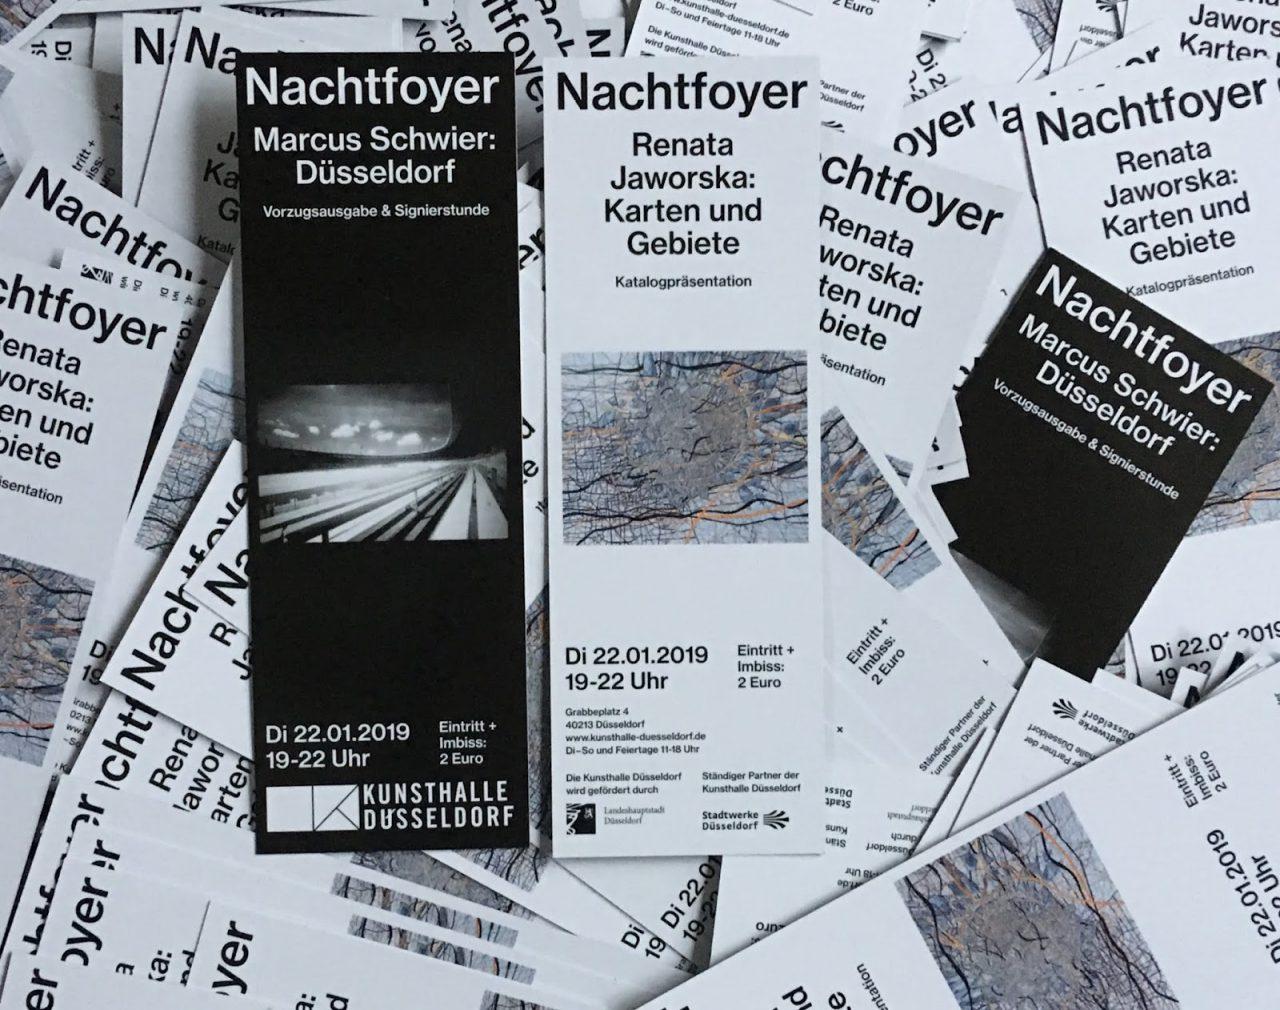 KUNSTHALLE DÜSSELDORF, Nachtfoyer image